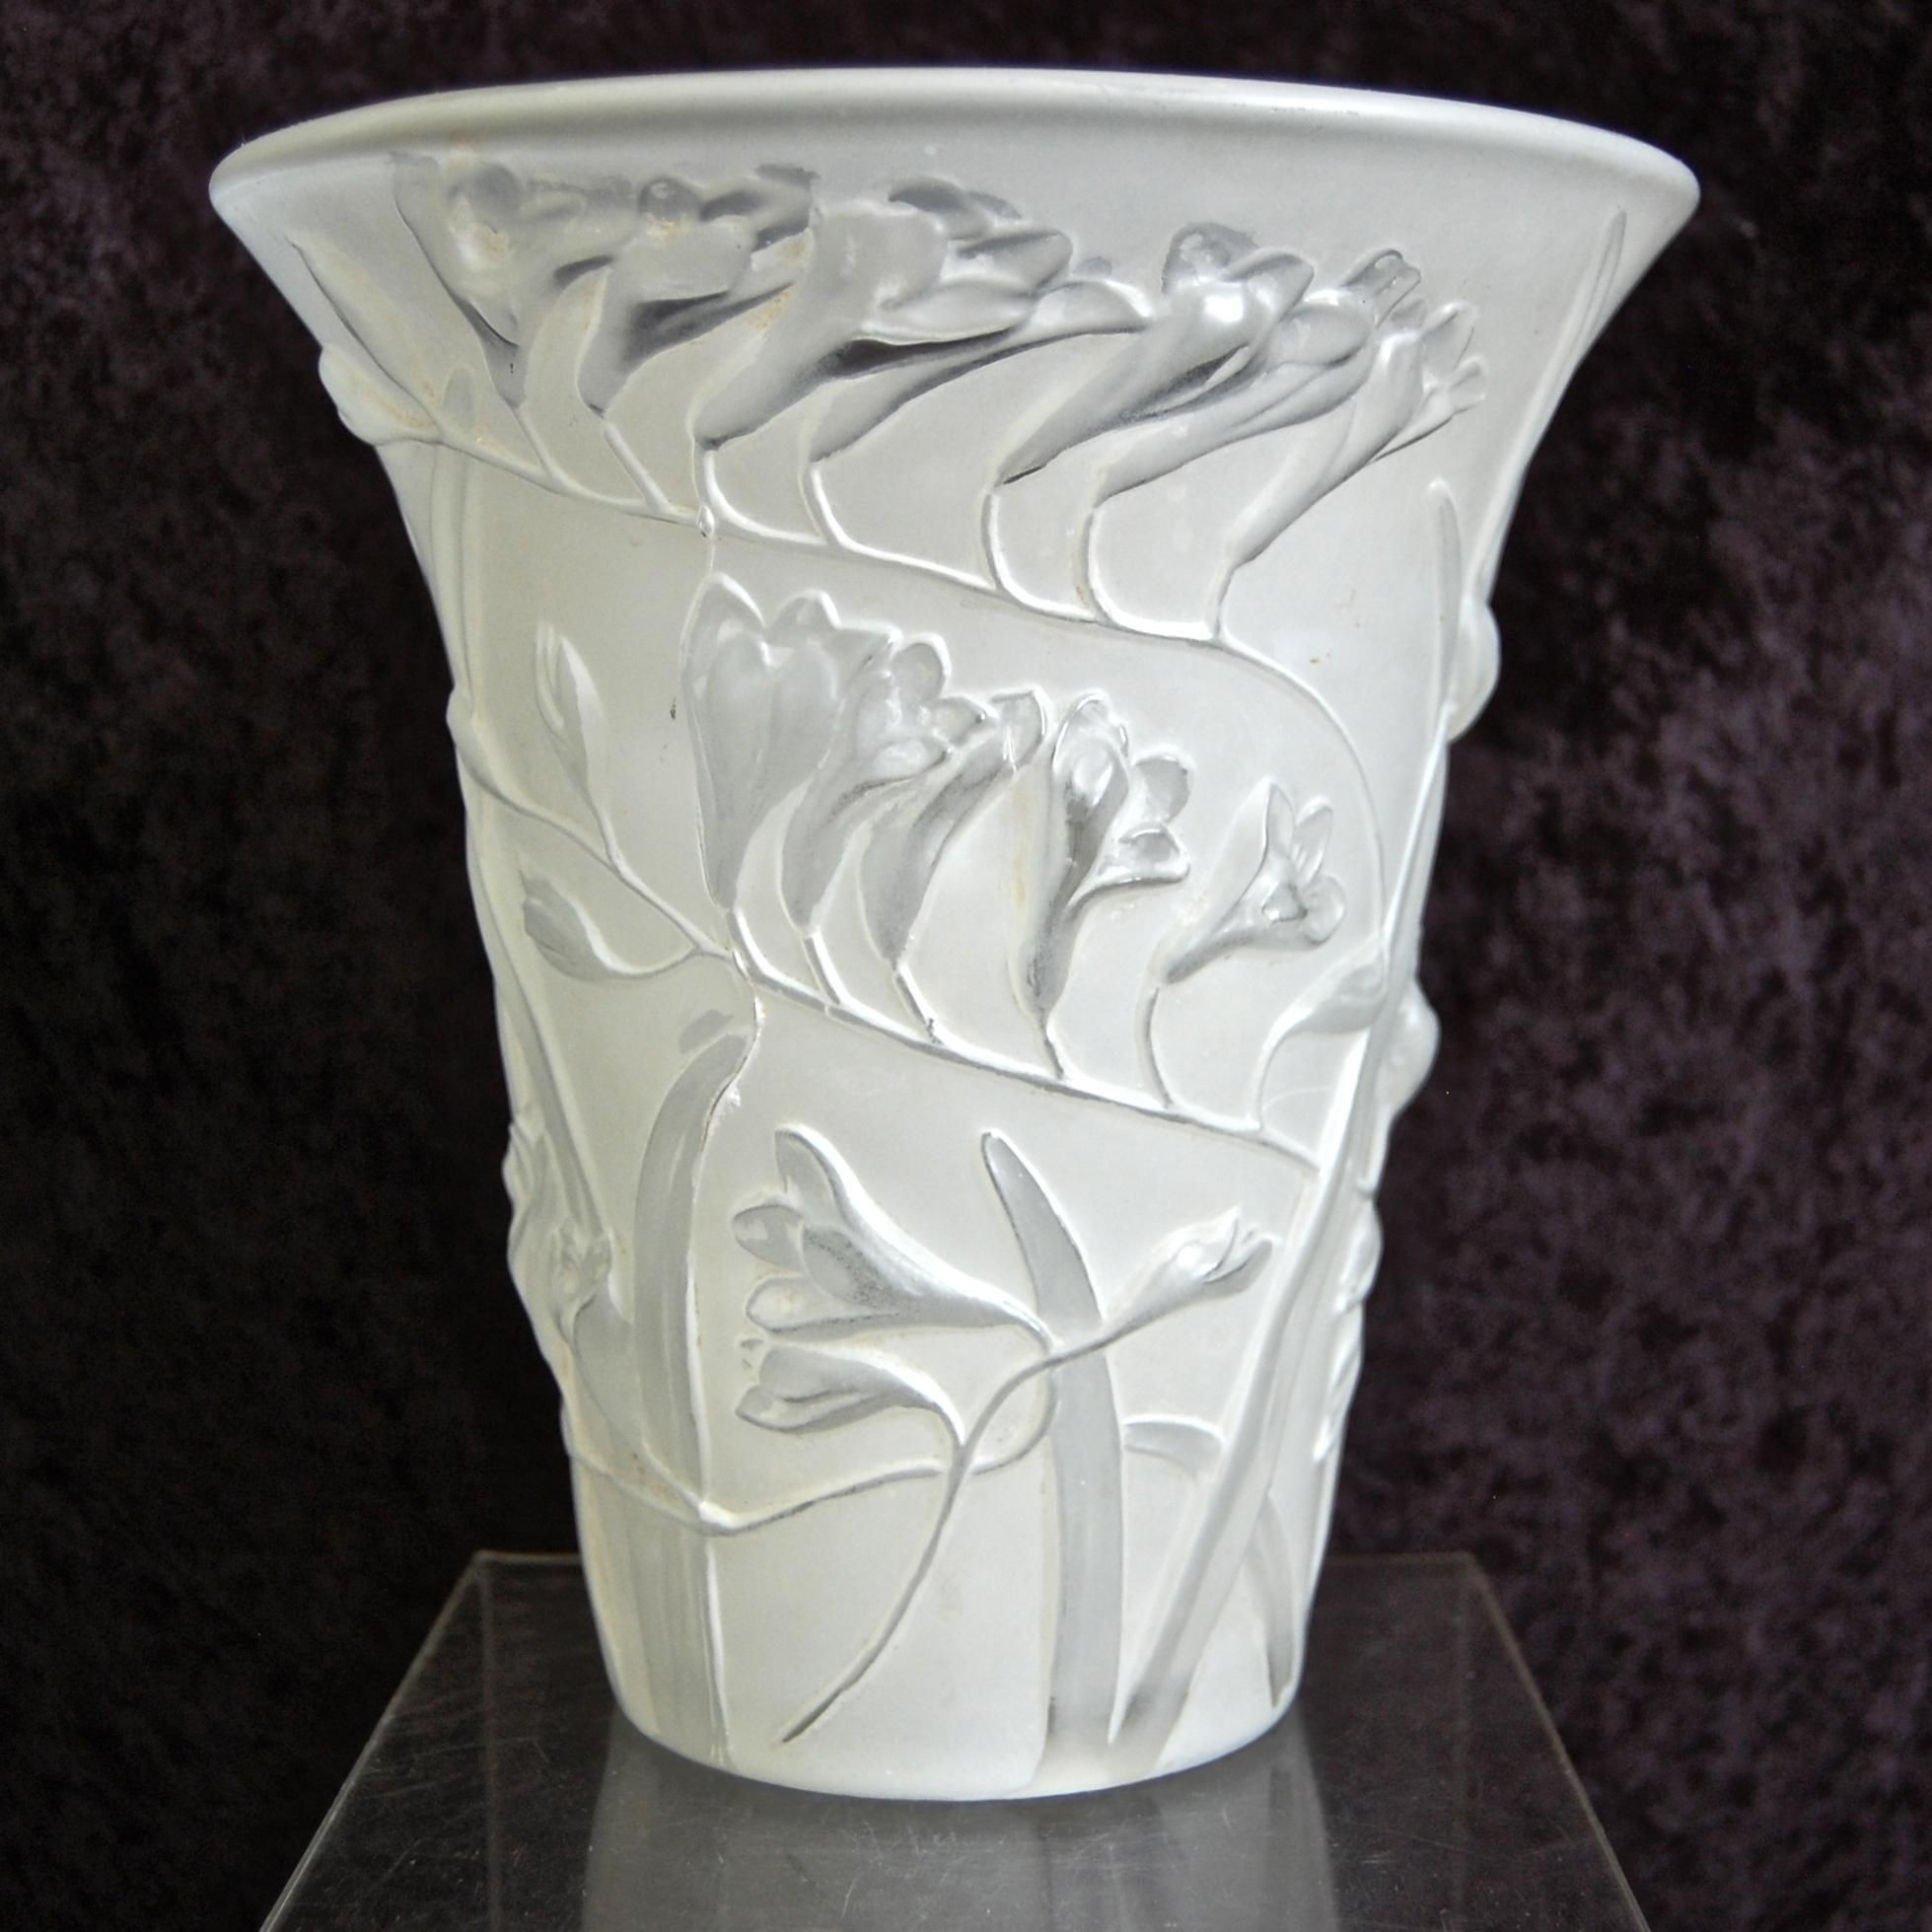 phoenix glass vase of phoenix glass sculptured artware freesia vase white circa 1934 in phoenix glass sculptured artware freesia vase white circa 1934